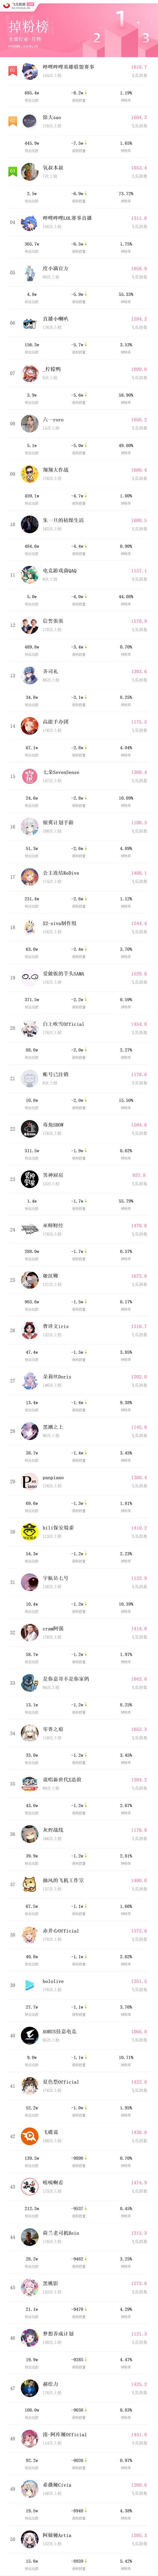 b站百大up主名单-2020 B站UP主掉粉排行月榜榜单